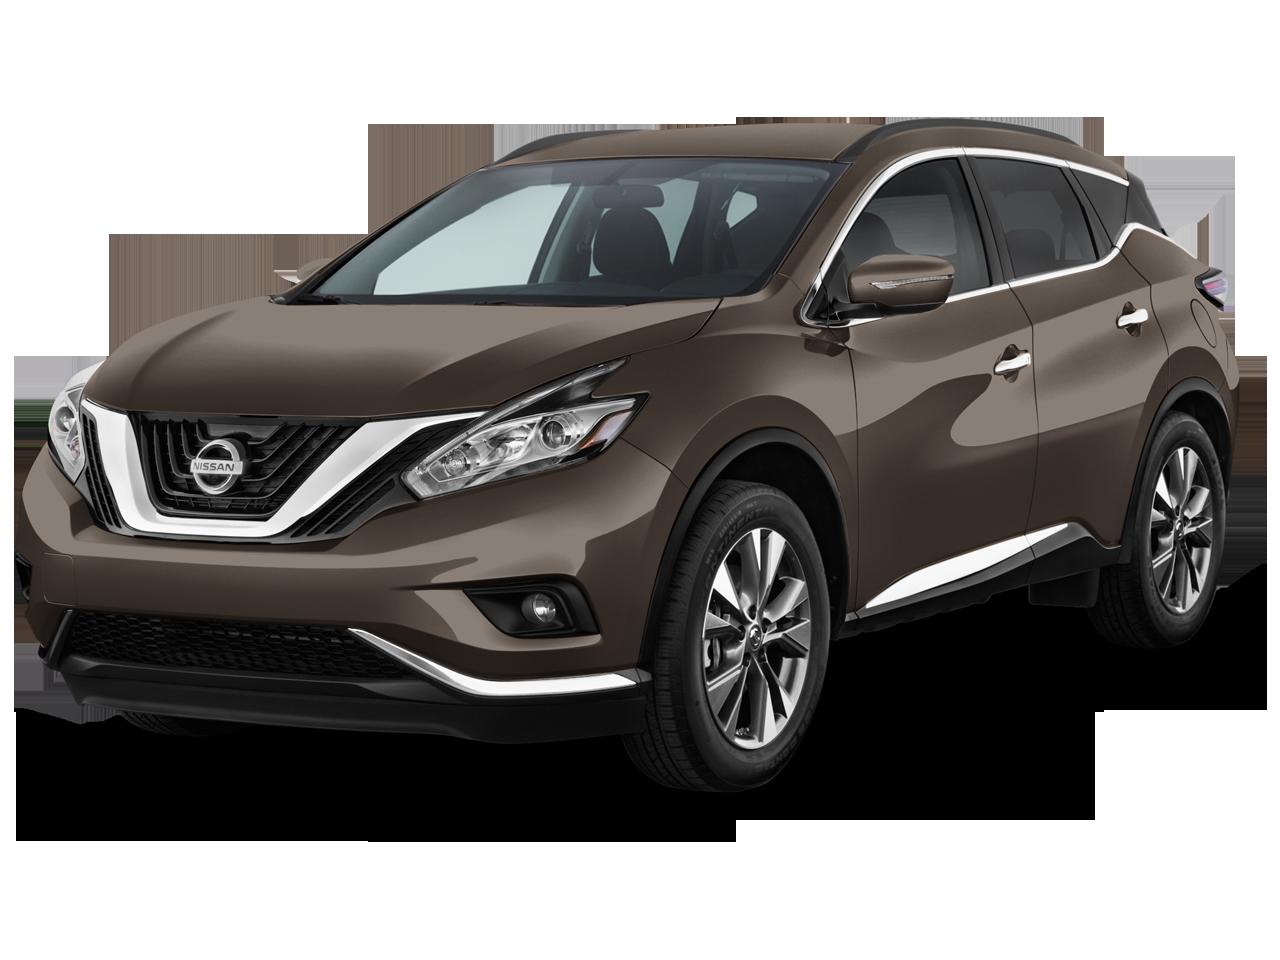 New 2017 Nissan Murano S - Near Elk Grove CA - Nissan of ...